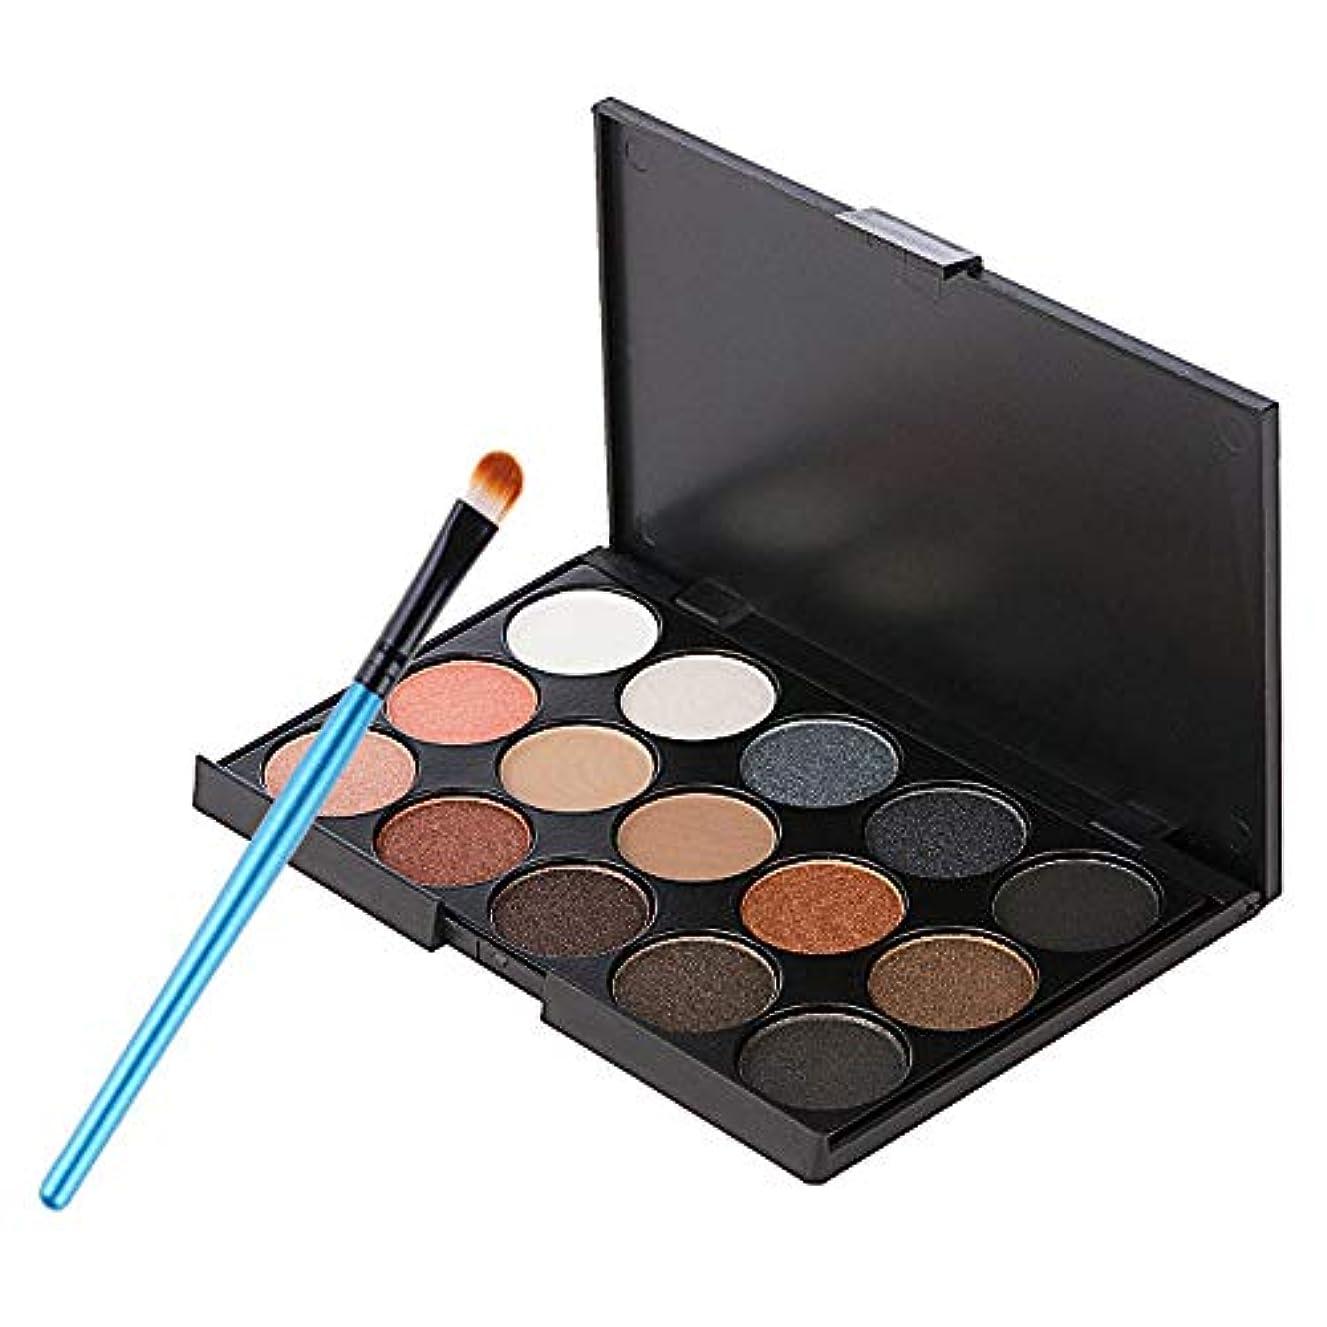 Lazayyii 15色 アイシャドウパレット 化粧ブラシ Eye Shadow グリッターアイシャドウ パール マットマット高発色 透明感 保湿成分 暖色系 アイシャドウ パレット (02#)